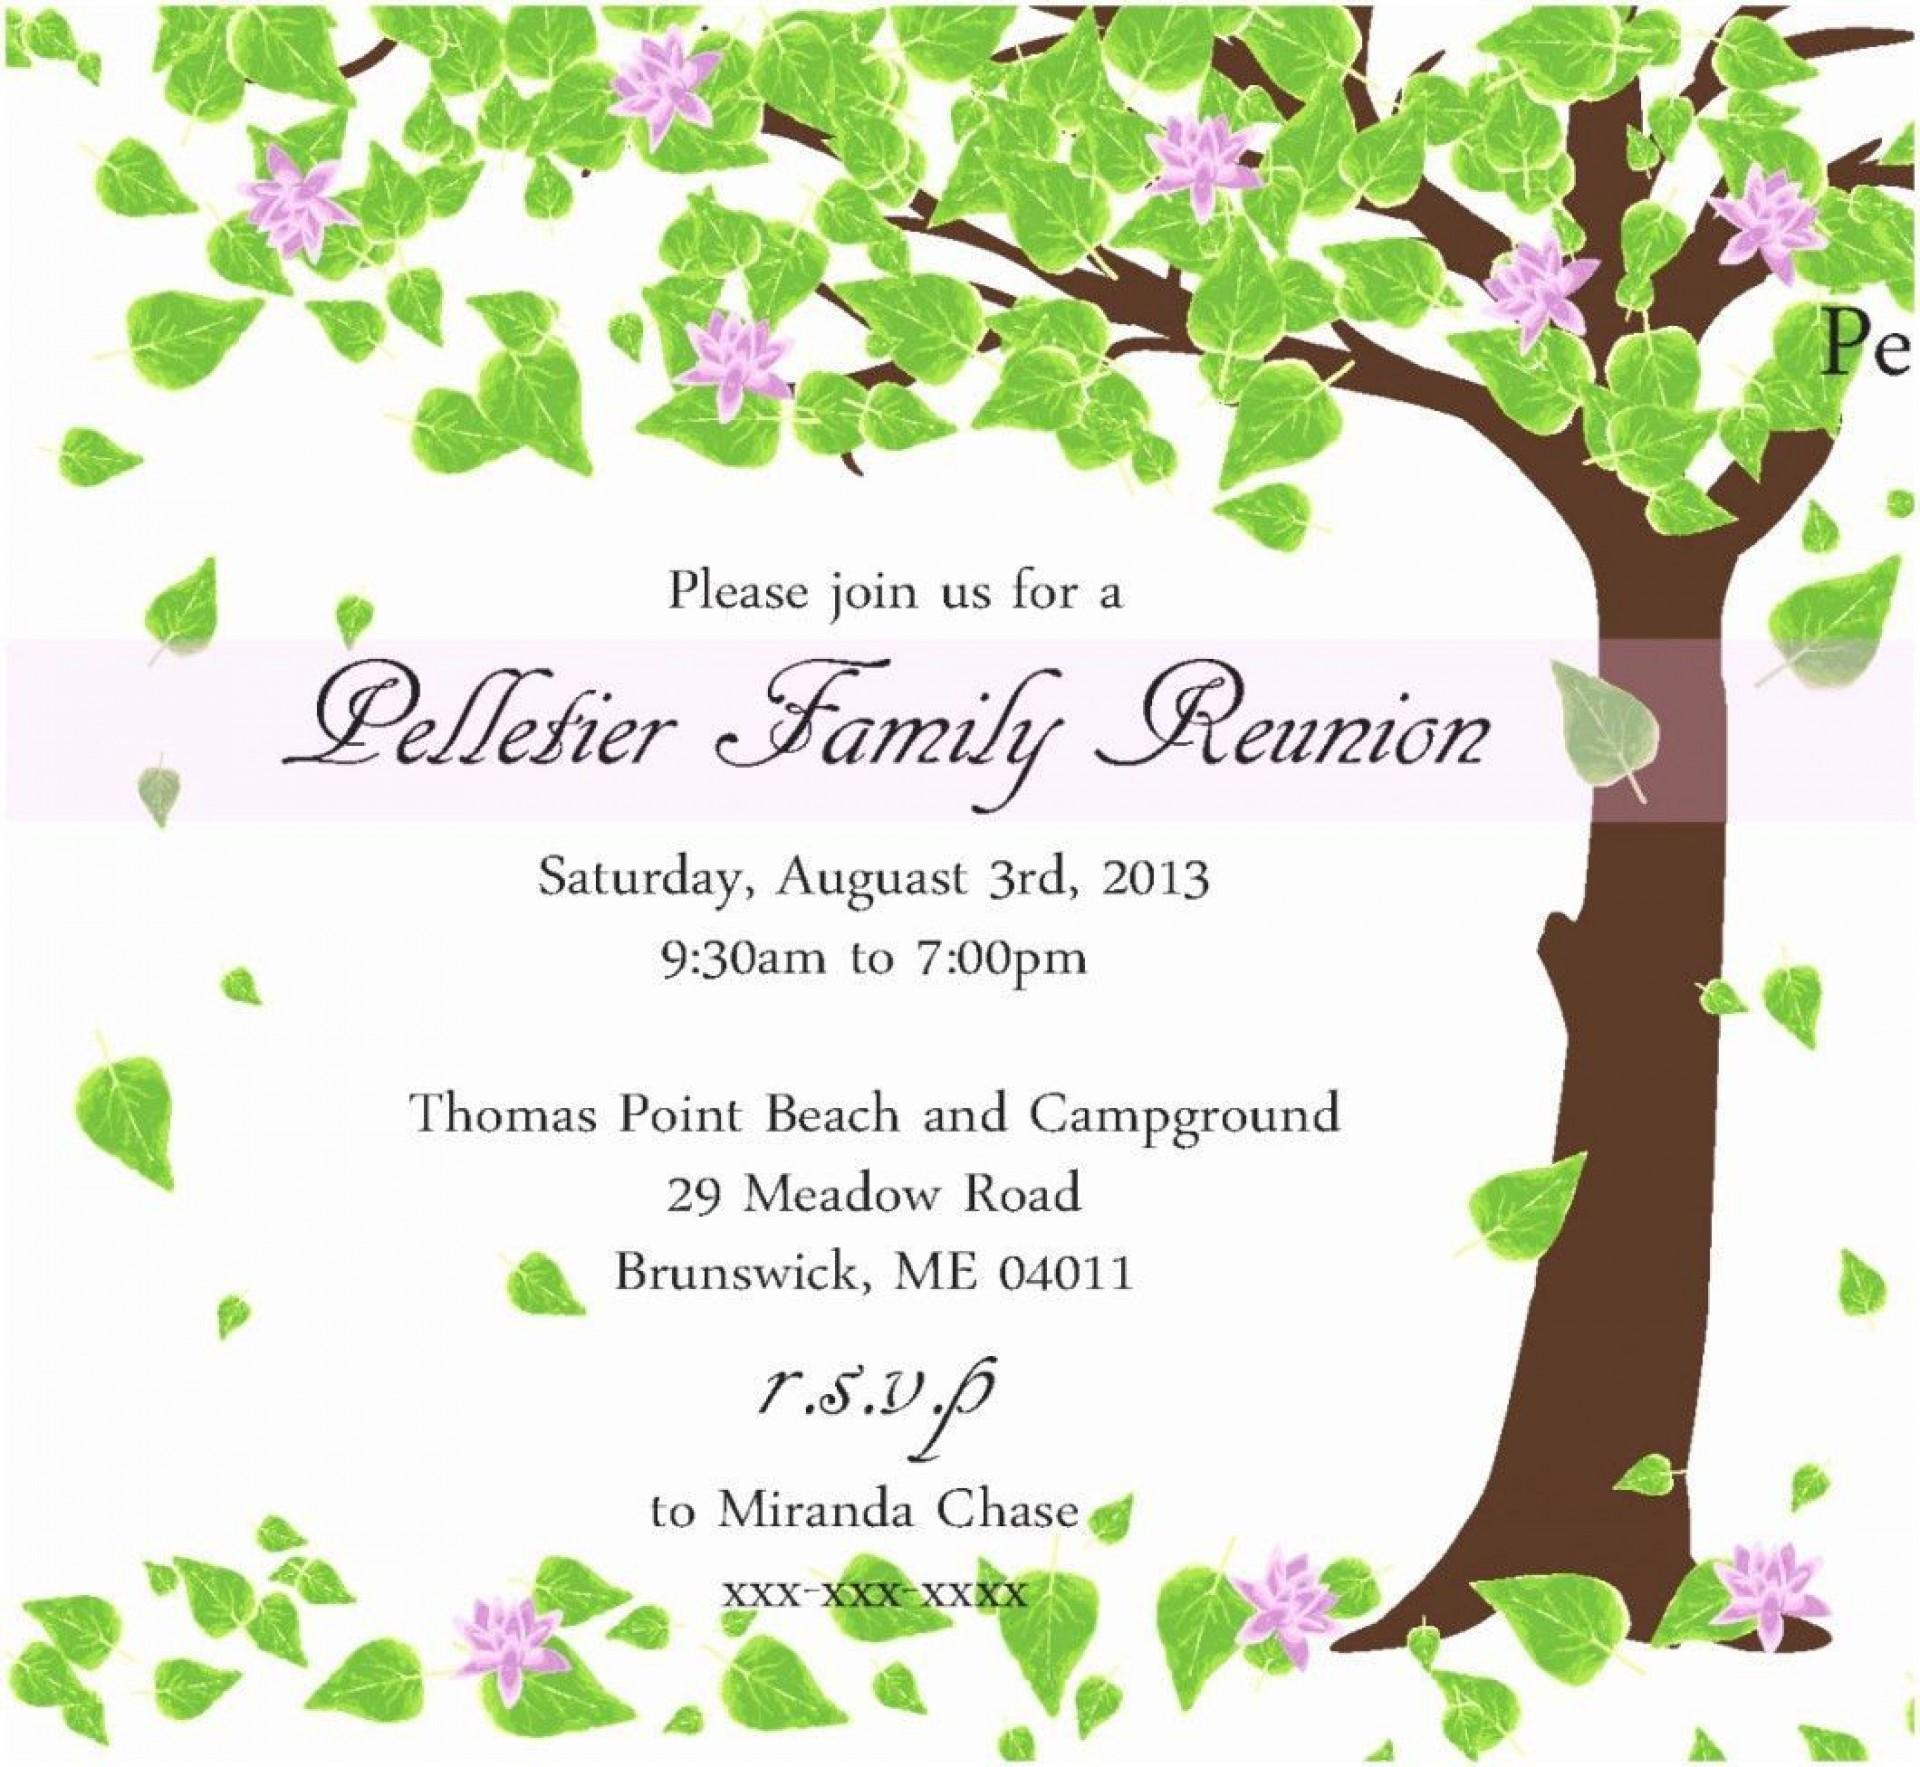 001 Wondrou Free Printable Family Reunion Invitation Template Highest Clarity  Templates Flyer1920